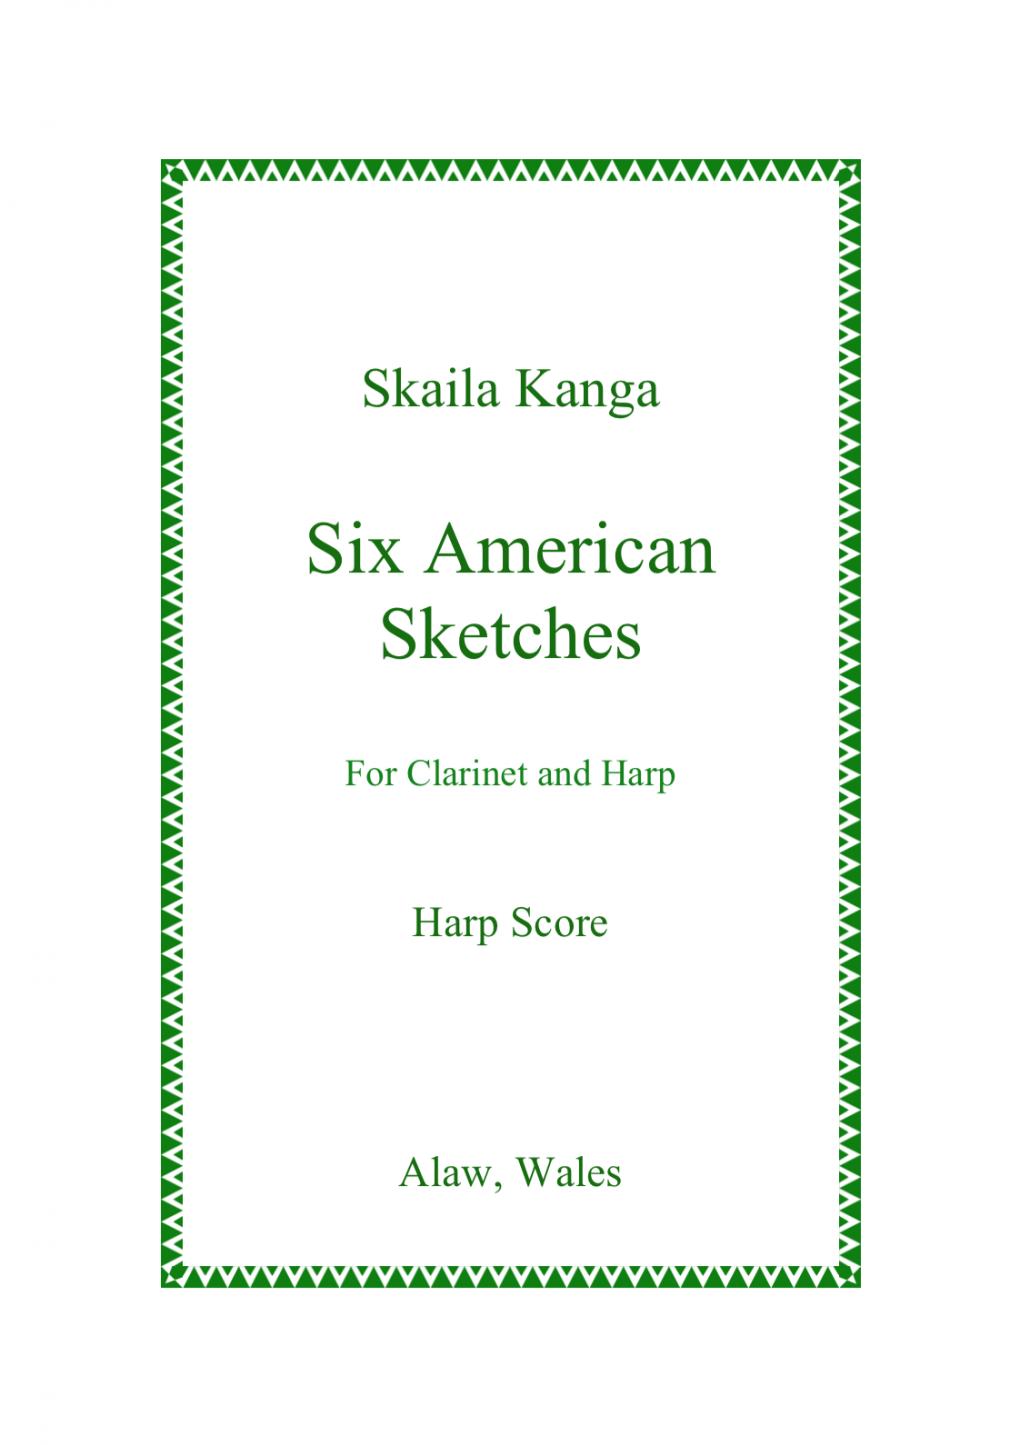 Six American Sketches - Skaila Kanga